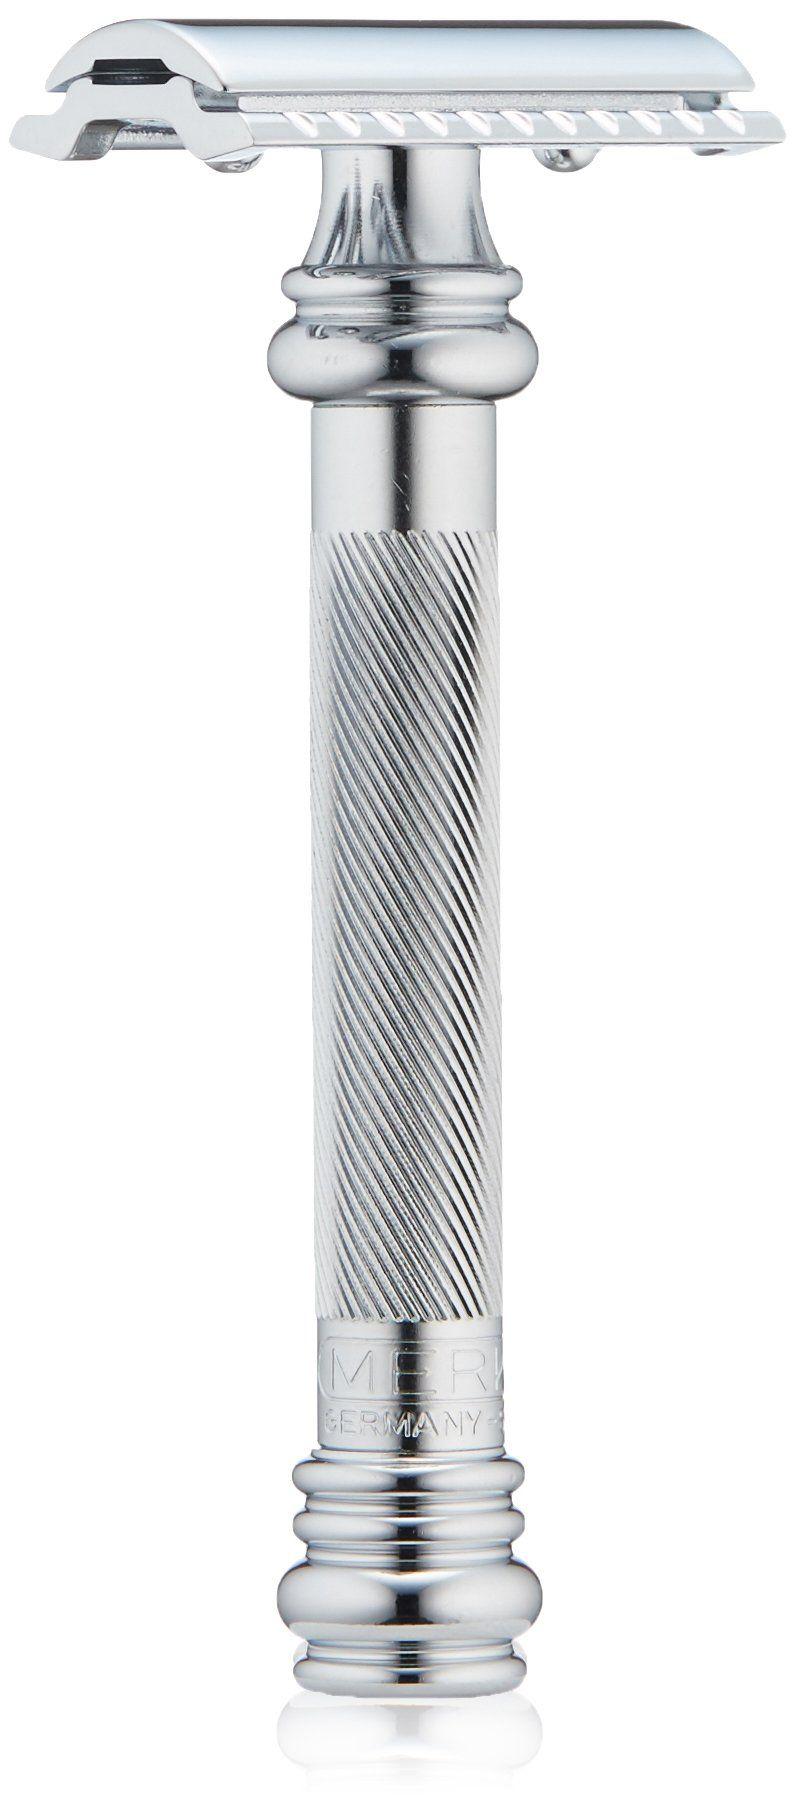 Merkur Heavy Duty Long Barber Pole Safety Razor Chrome